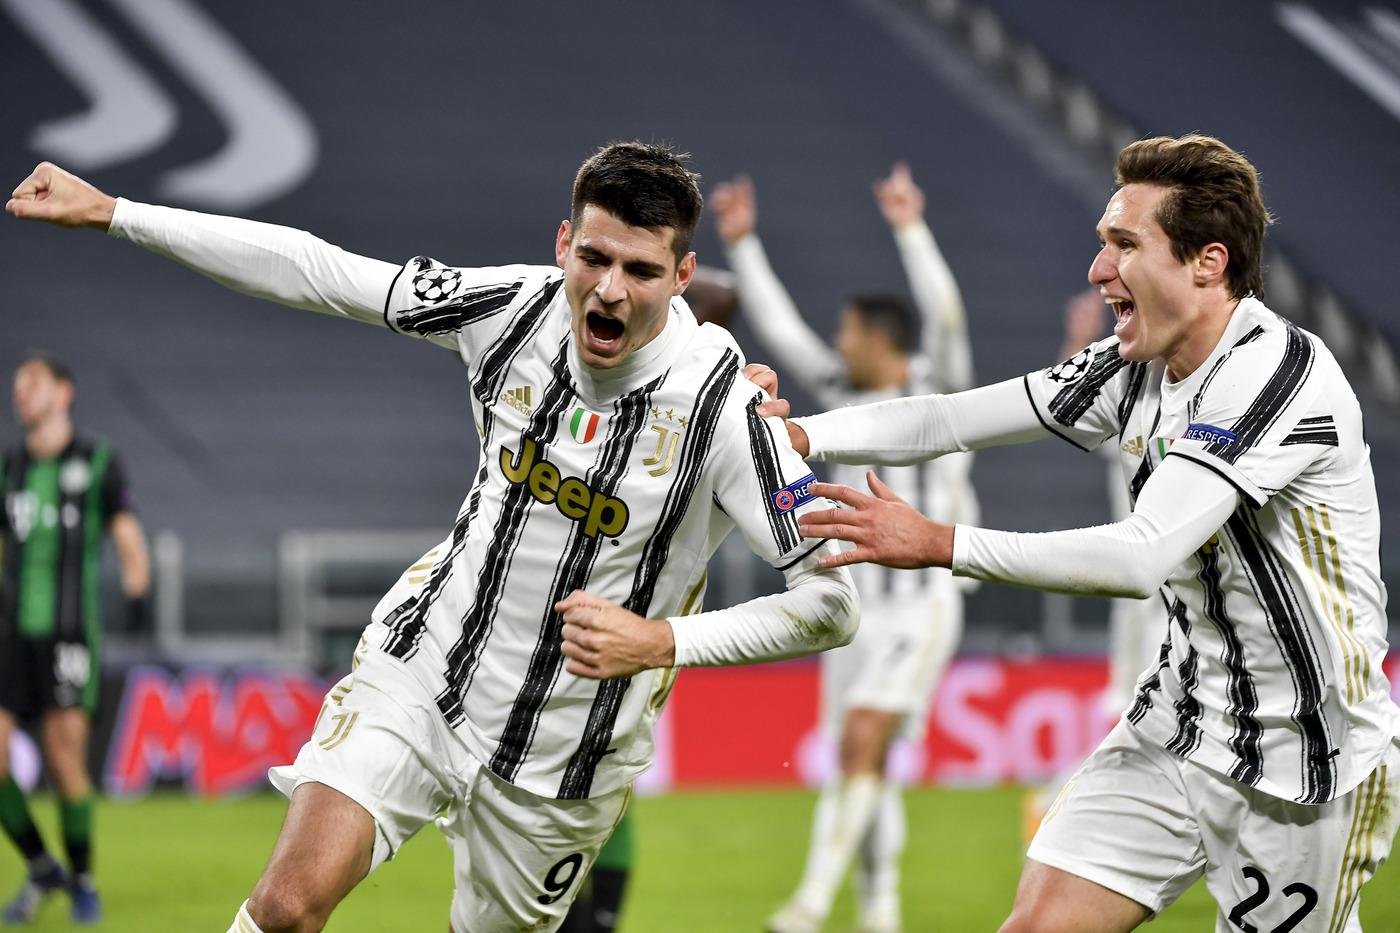 Juventus Fc vs Ferencvaros - Uefa Champions League 2020 2021